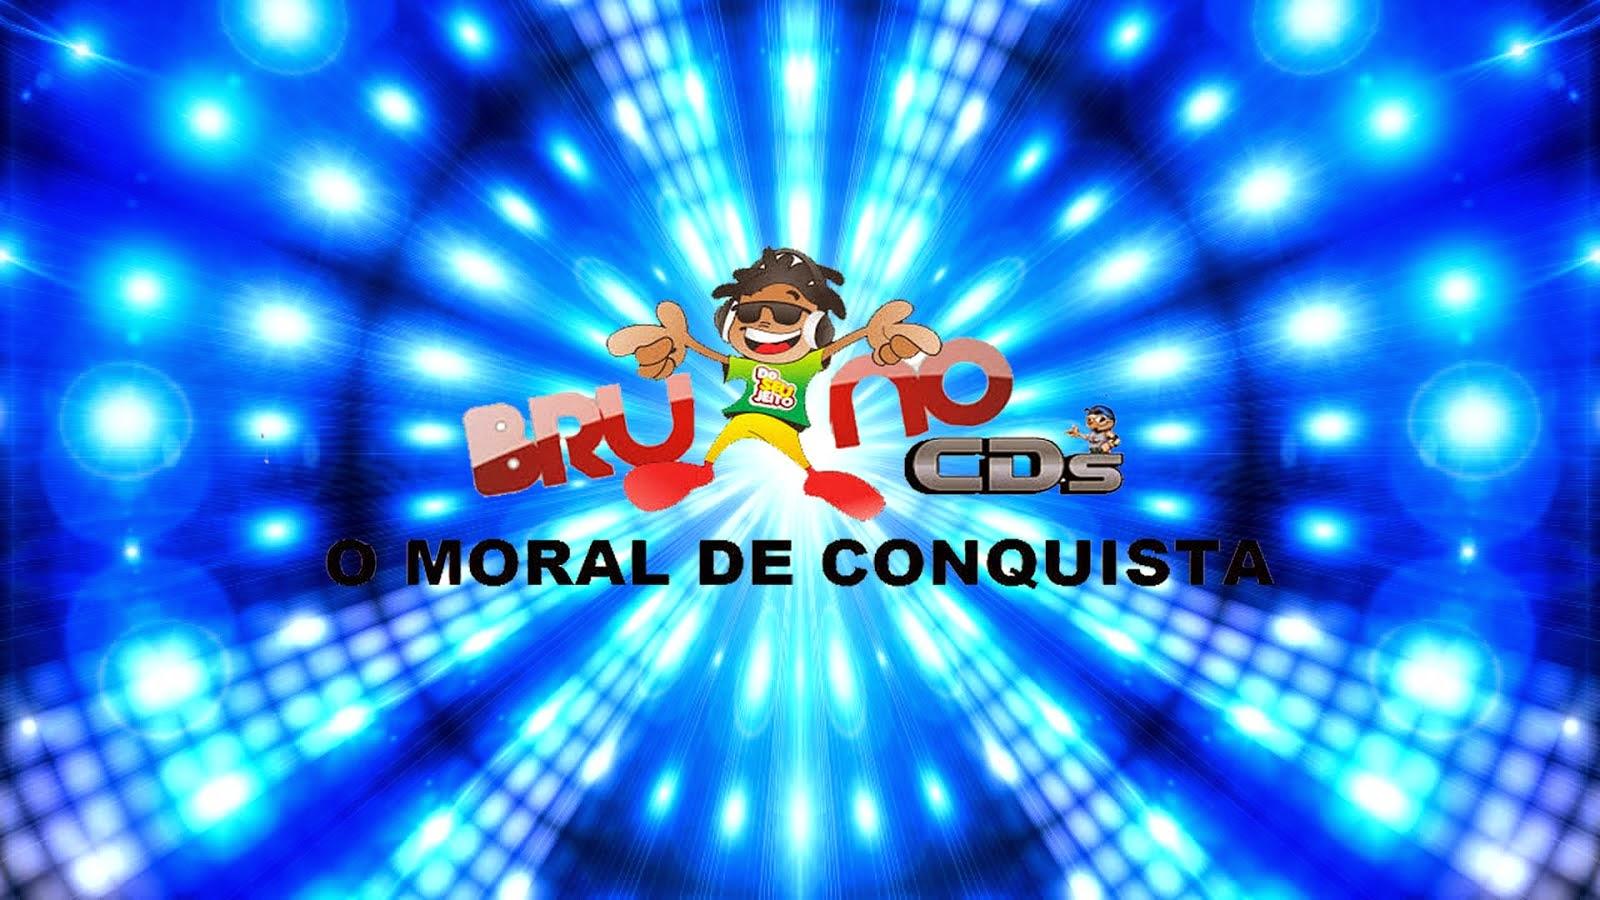 BRUNNO CD'S O MORAL DE CONQUISTA